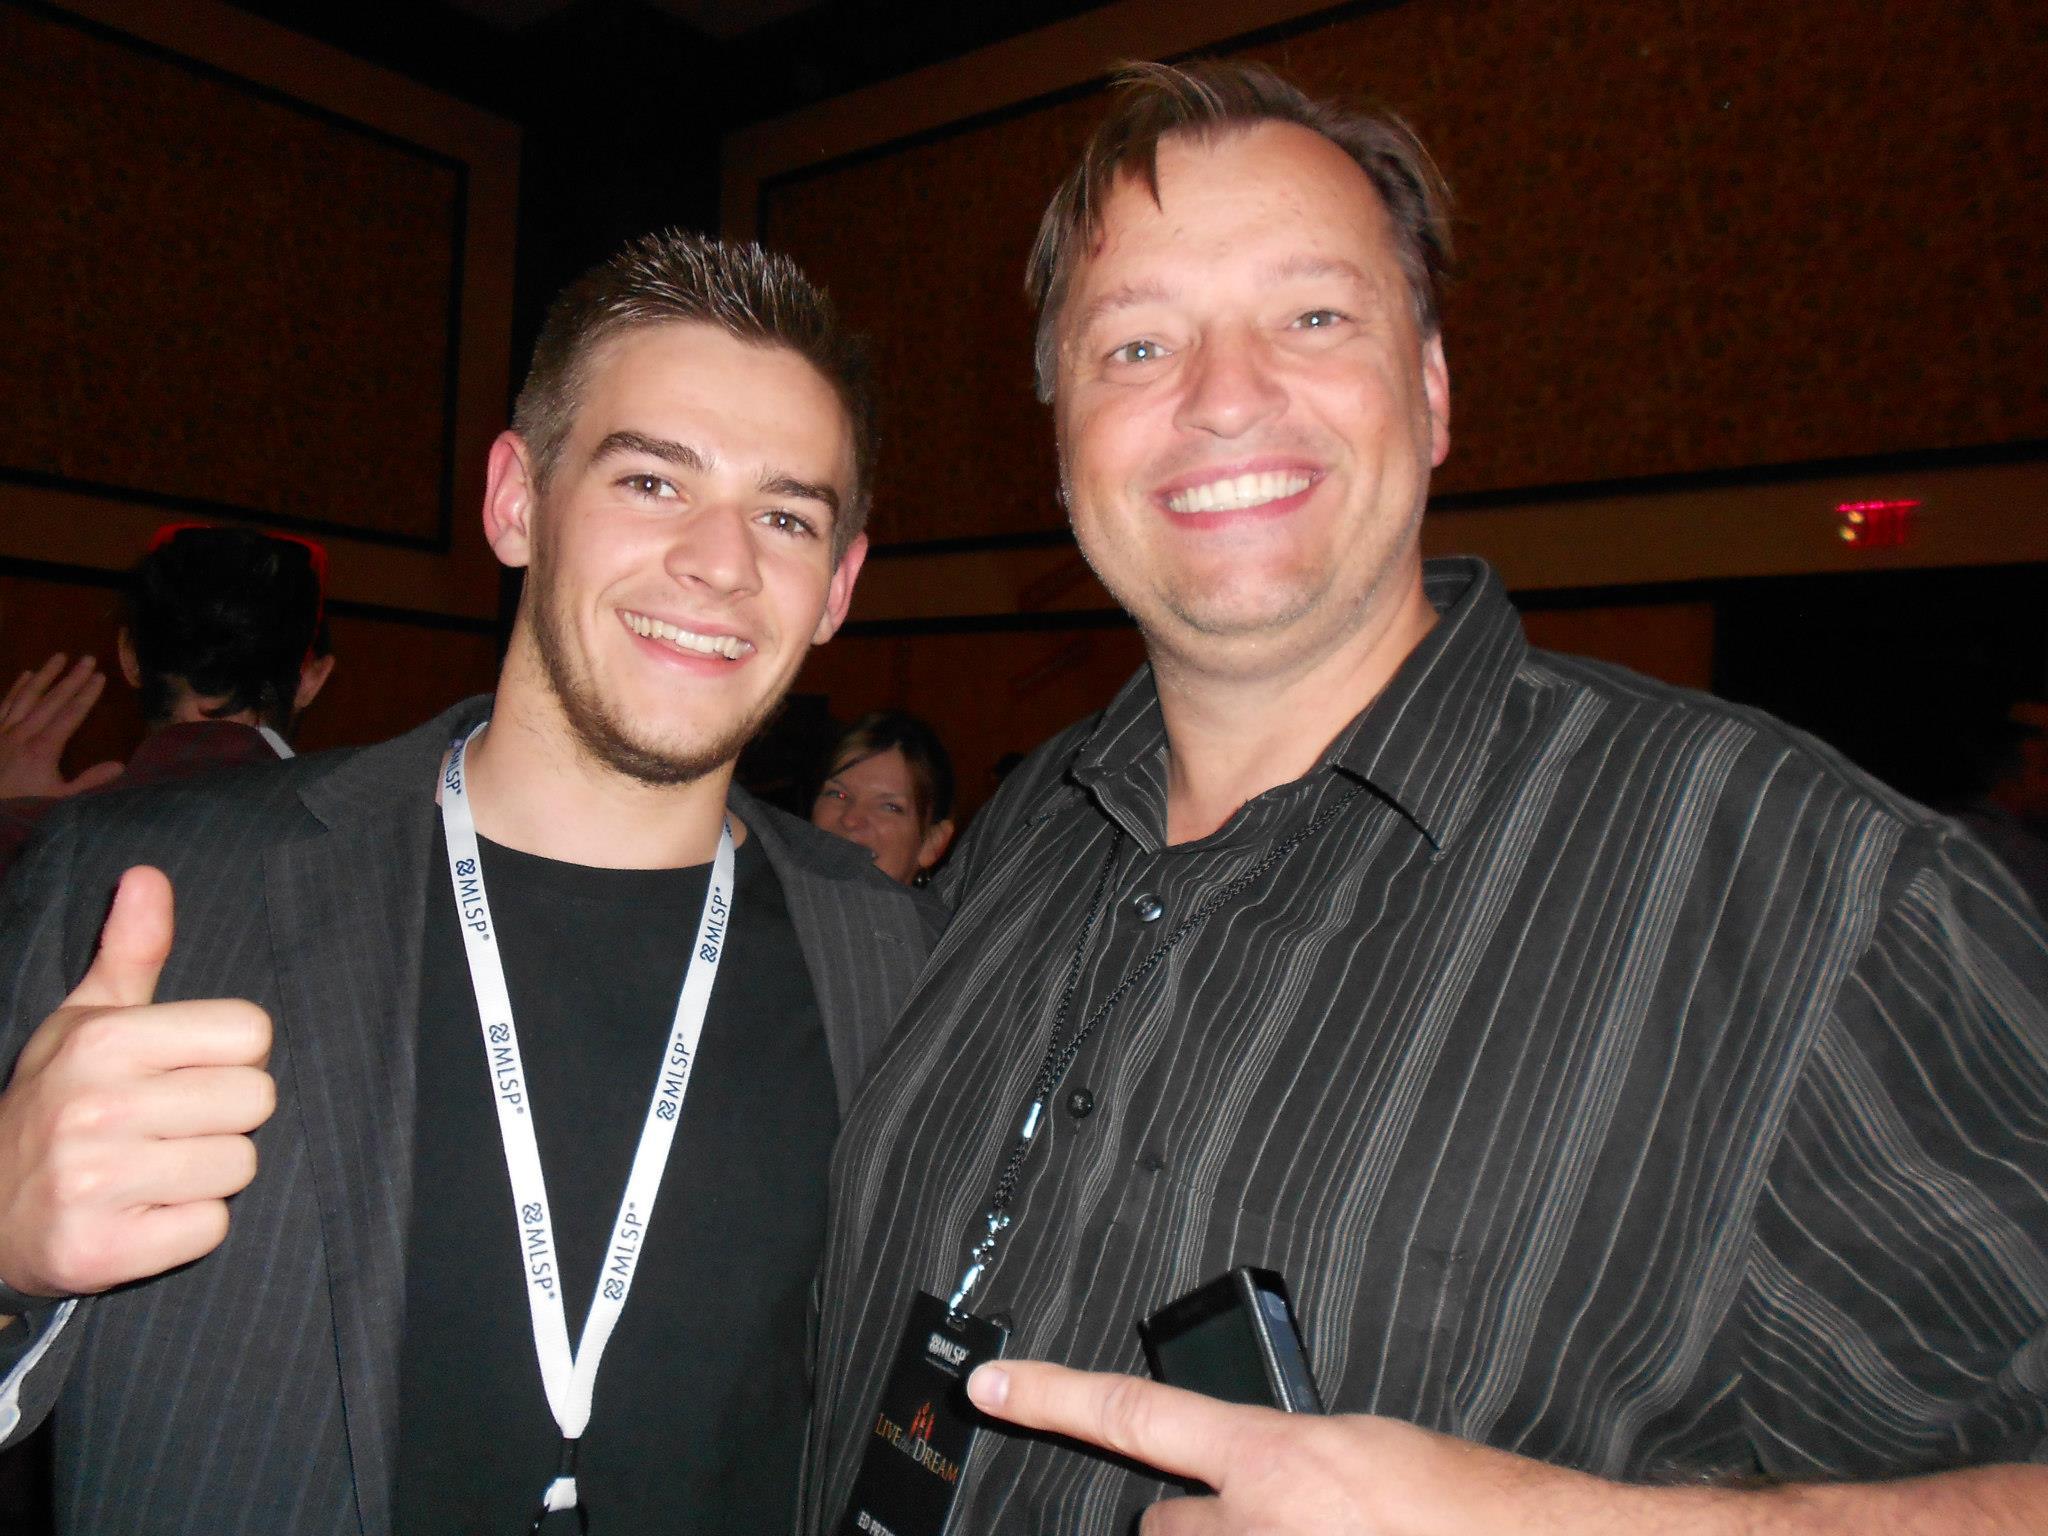 Seb Brantigan, 6 fig earner Ed Przybylski at Live the Dream in Dallas Texas